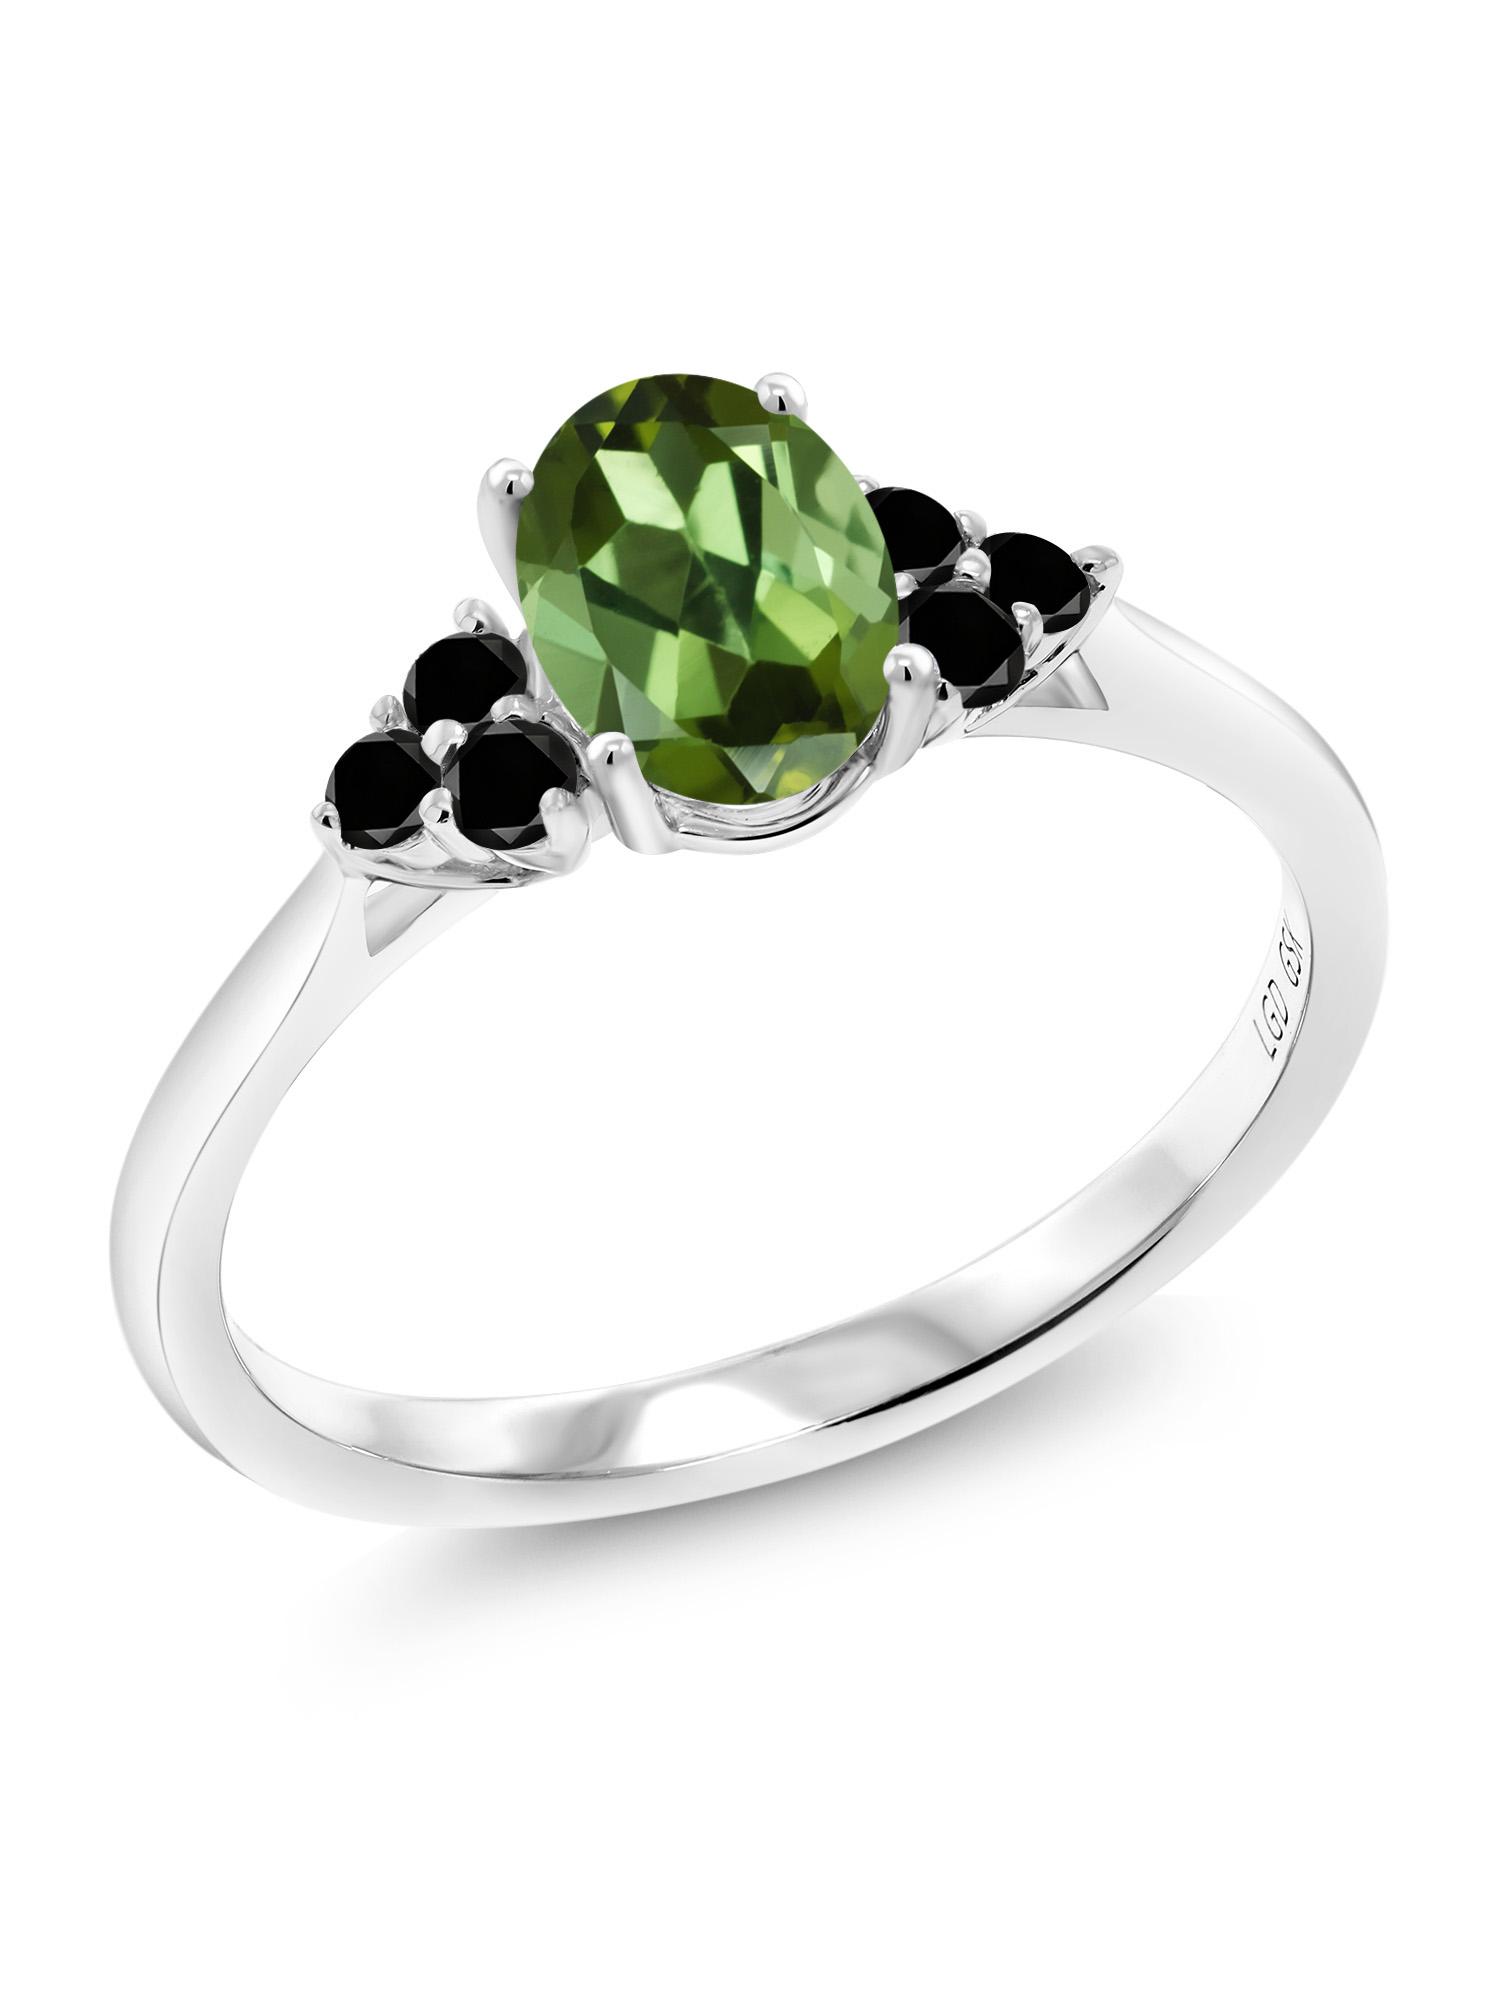 0.90 Ct Oval Green Tourmaline Black Diamond 10K White Gold Ring by